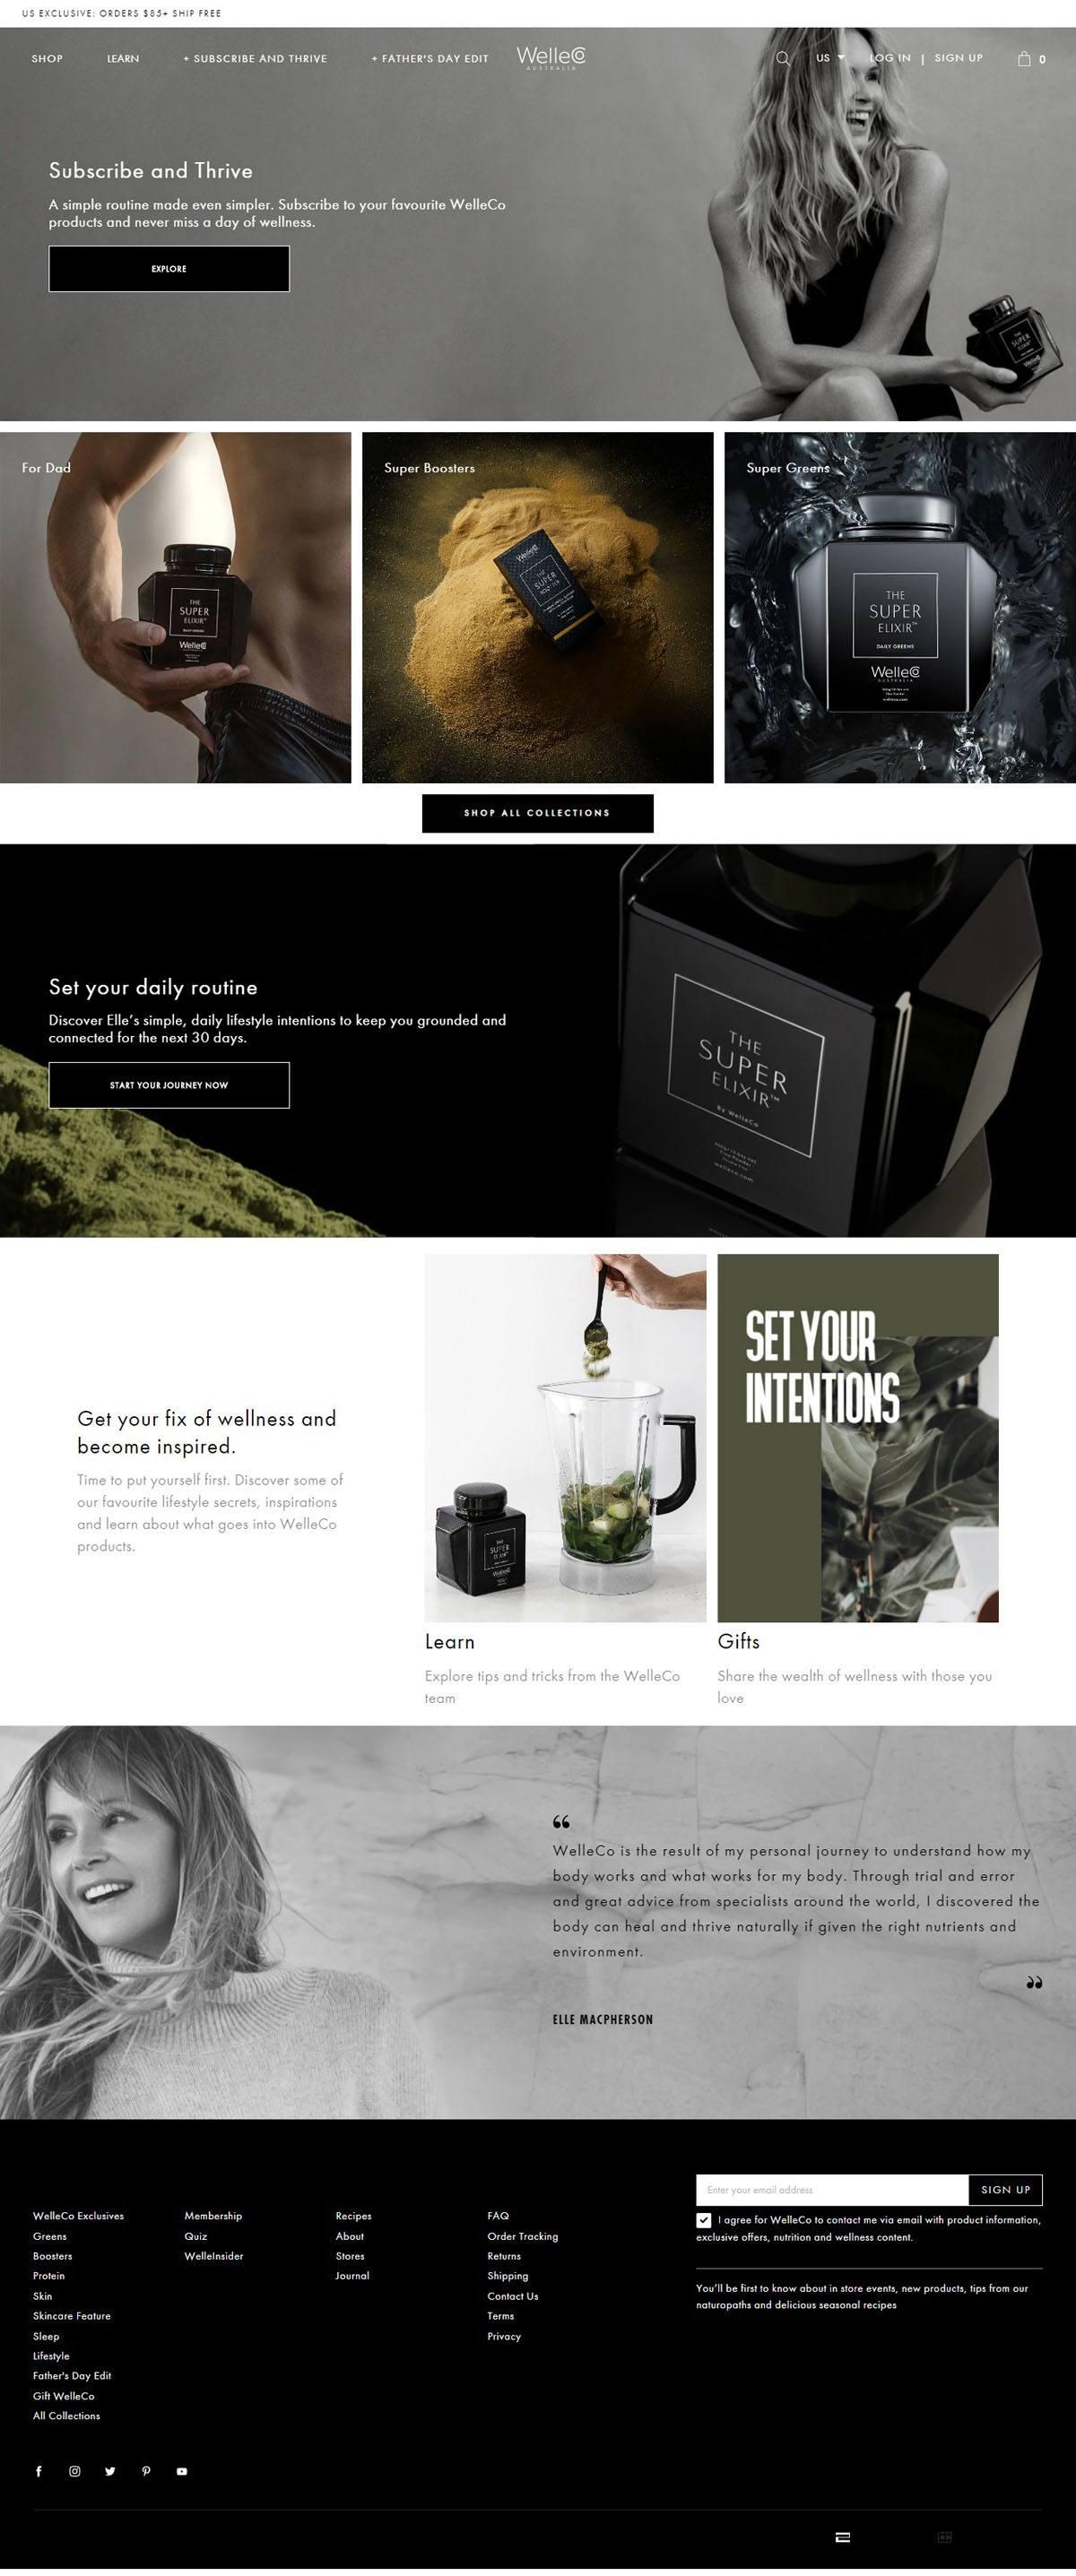 eCommerce website: WelleCo